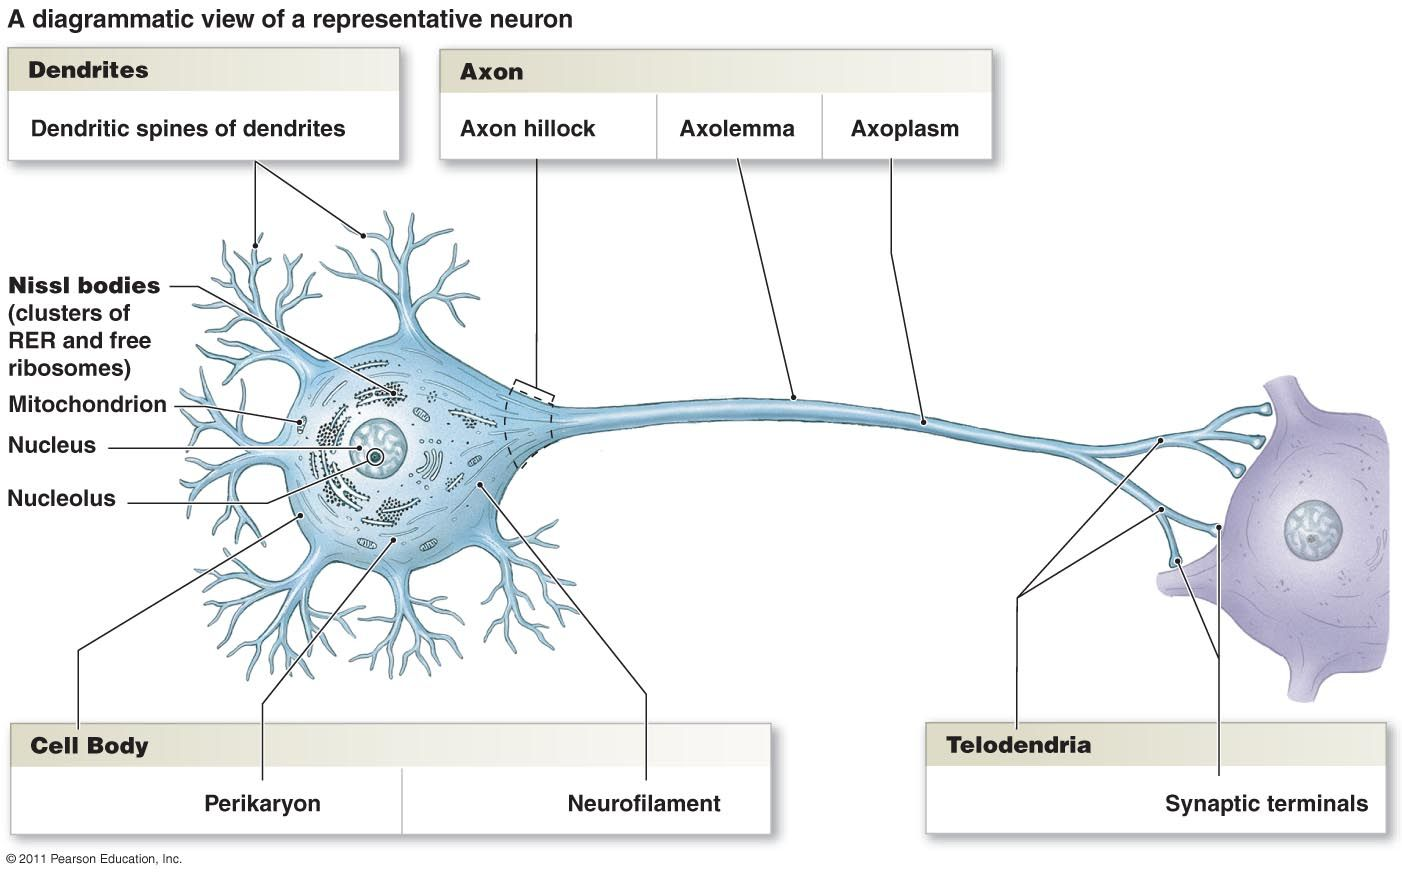 medium resolution of diagrammatic view of a representative neuron neurons nervous system neuroscience biology diagram